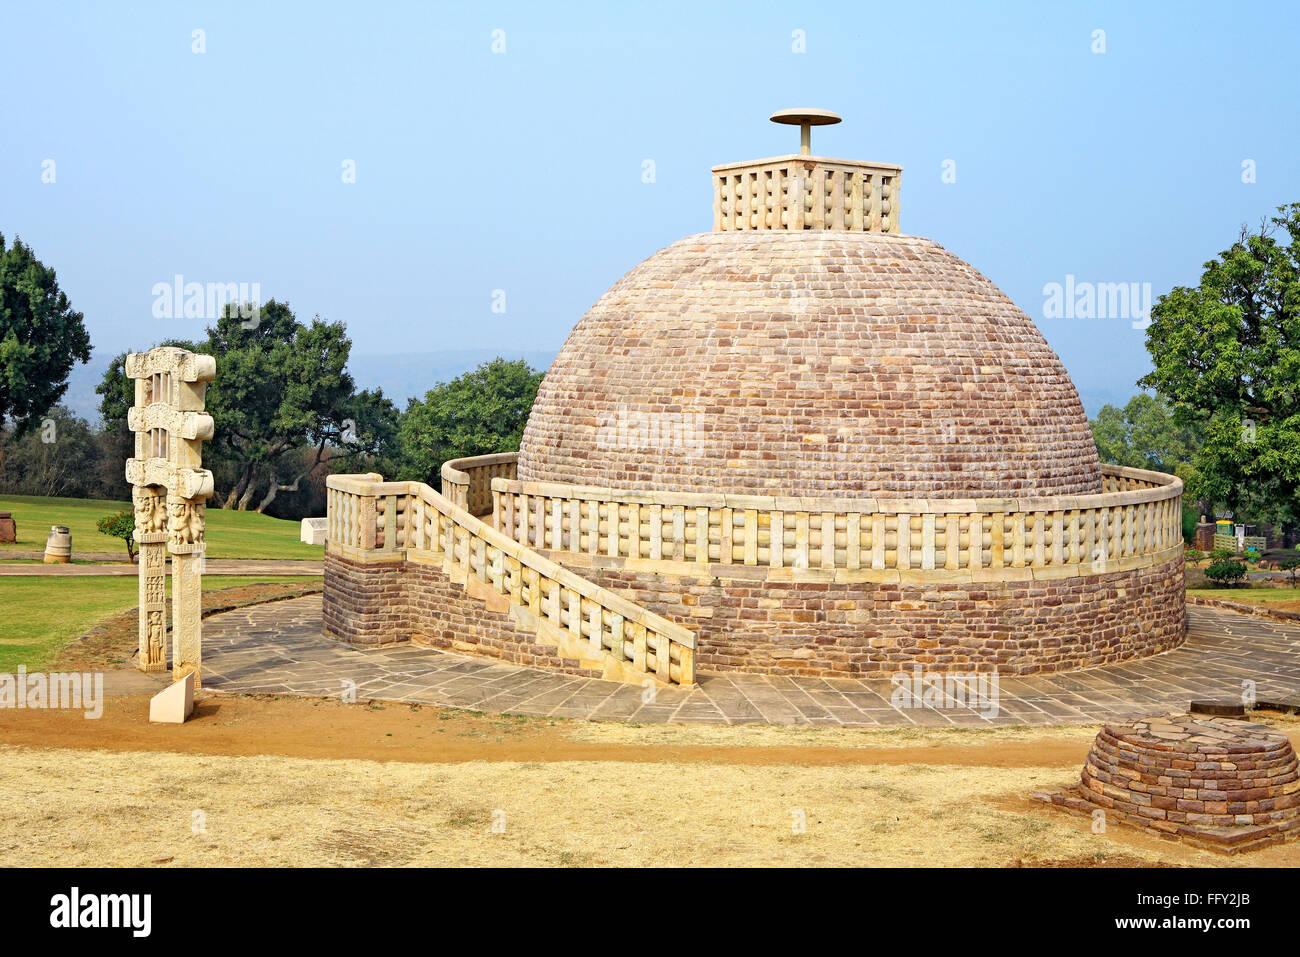 Stupa 3 stands northeast of main stupa 1 and similar in design but smaller one gateway Sanchi Bhopal Madhya Pradesh - Stock Image